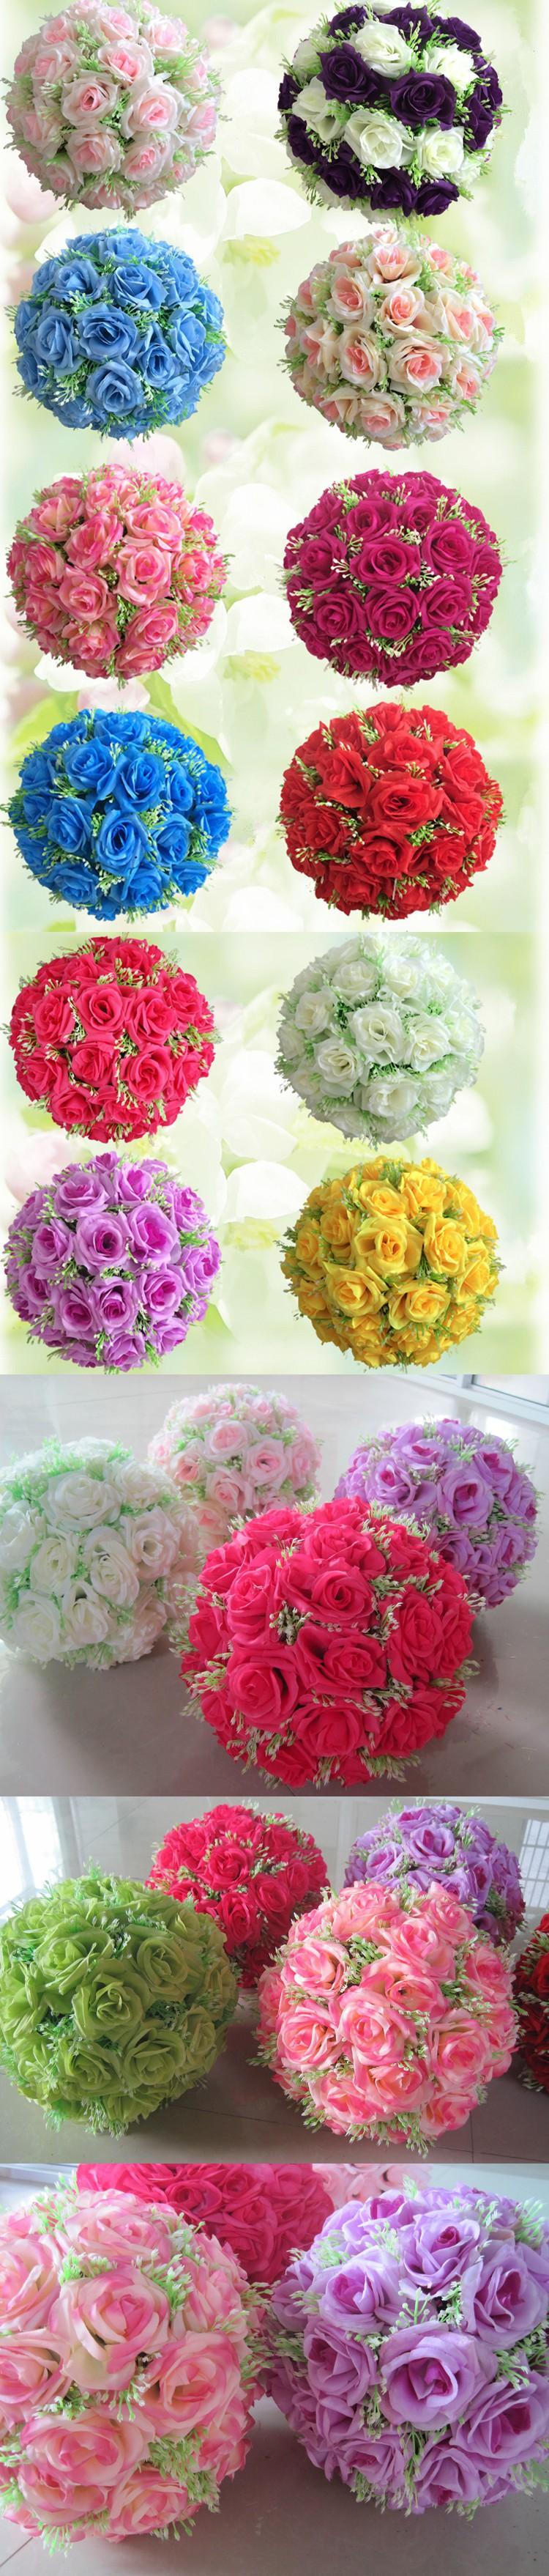 10inch 25cm silk flower kissing balls romantic flower ball 10inch 25cm silk flower kissing balls romantic flower ball centerpieces new hanging flower balls dhlflorist Gallery